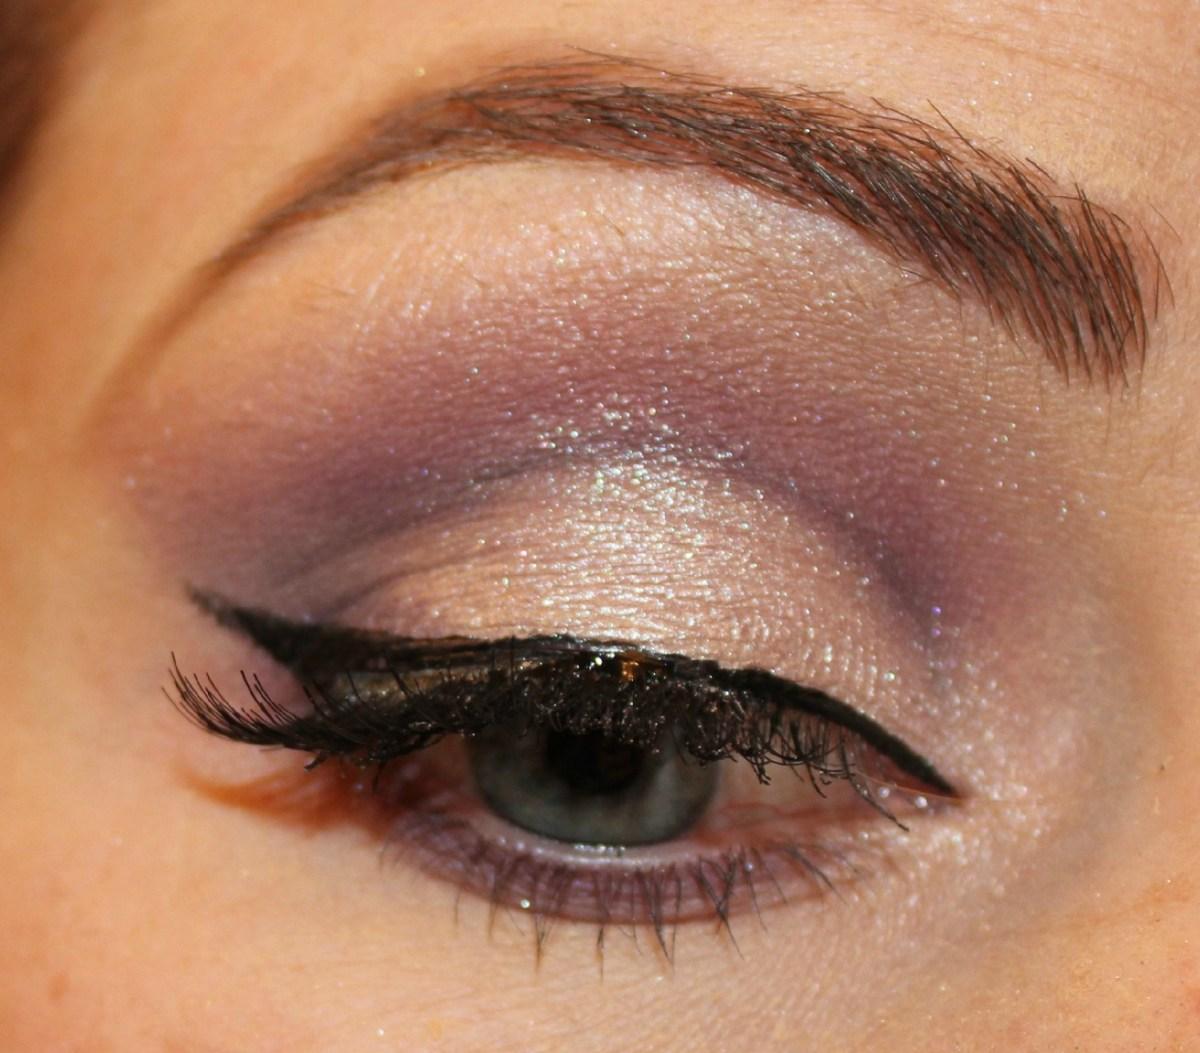 Eye Makeup Tutorial For Hazel Eyes Eye Makeup Tutorial Eye Makeup For Hazel Eyes